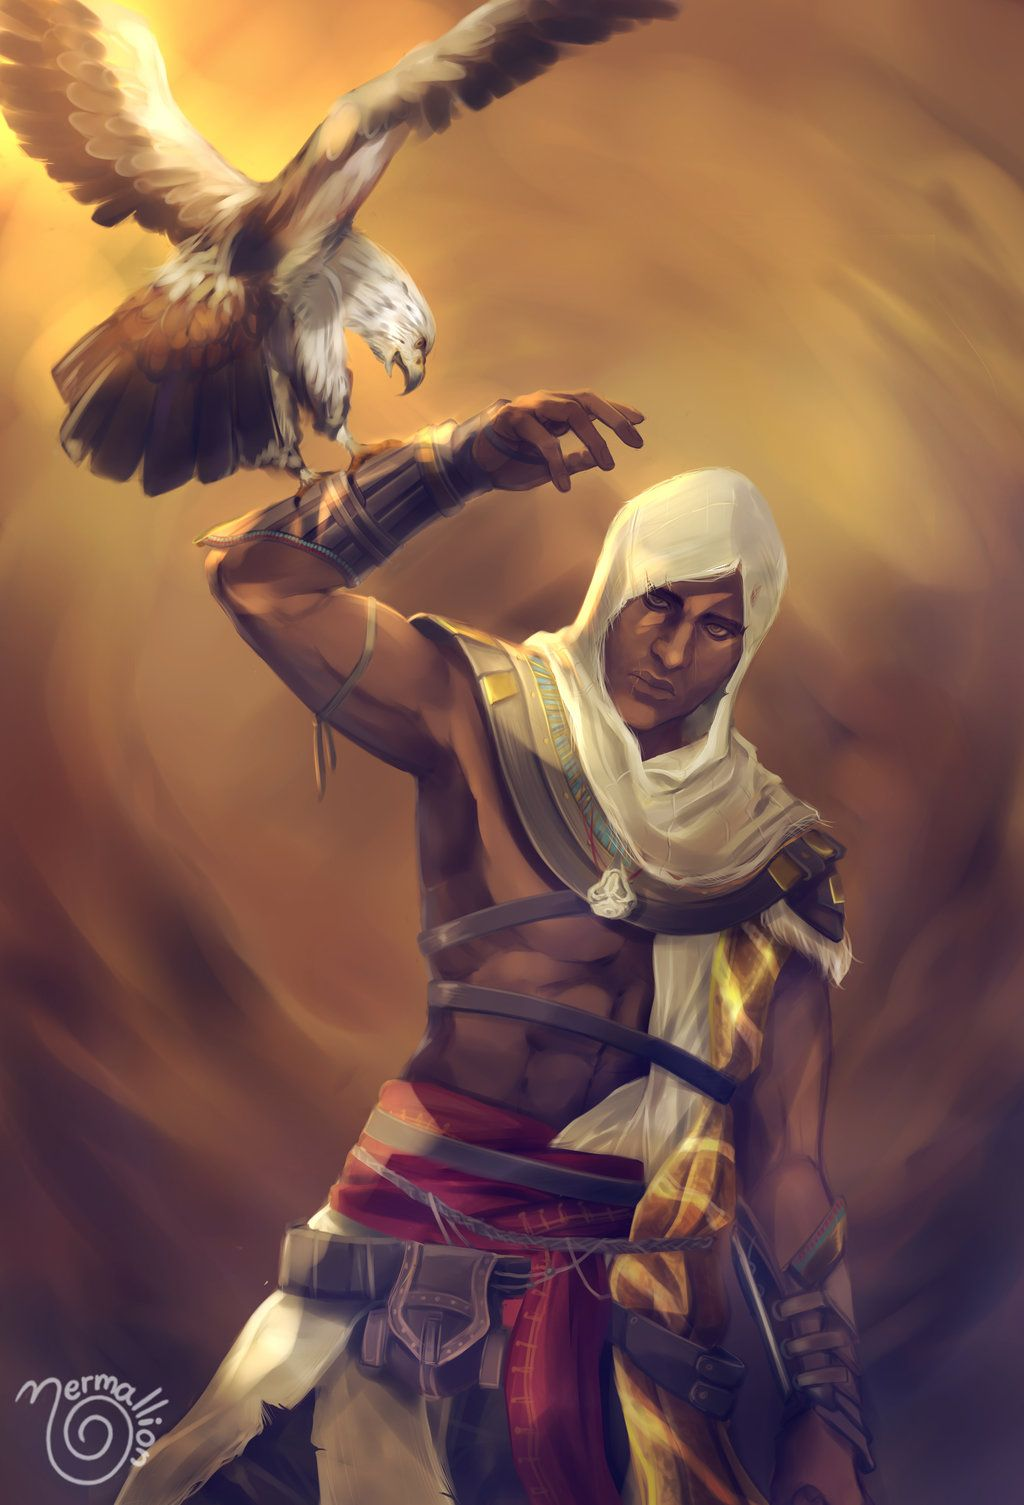 Bayek By Nermallion Assassins Creed Artwork Assassins Creed Art Assassin S Creed